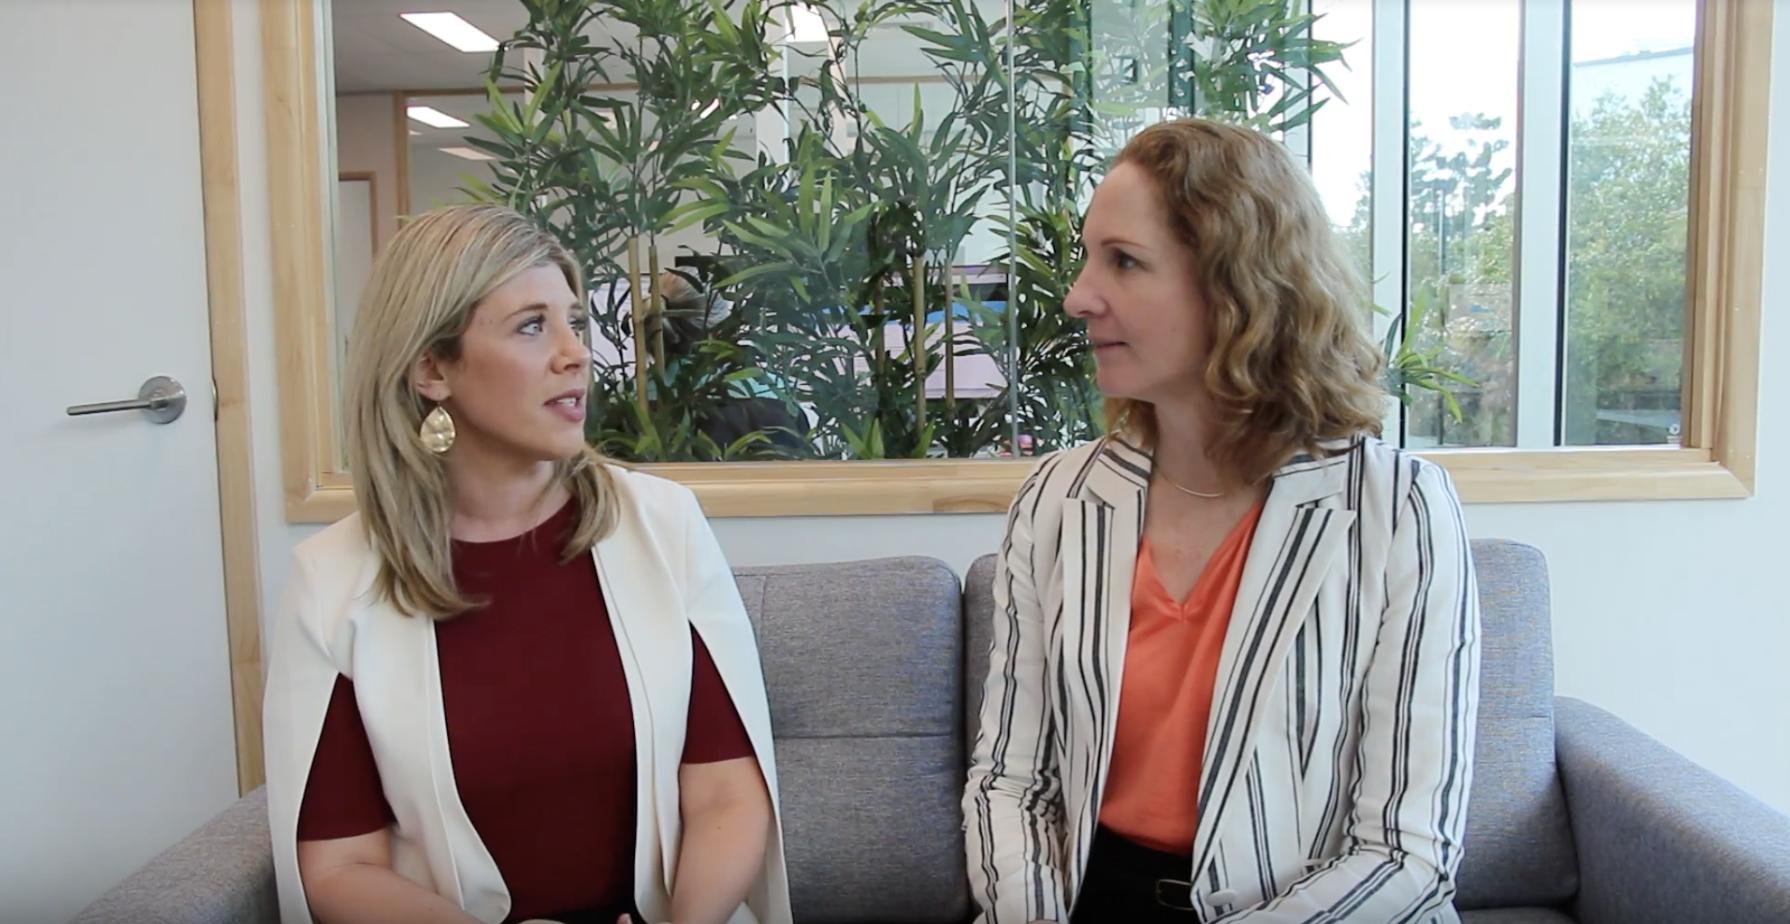 Ellie Bakker and Jeanette Jifkins Discuss Compliant Google Reviews